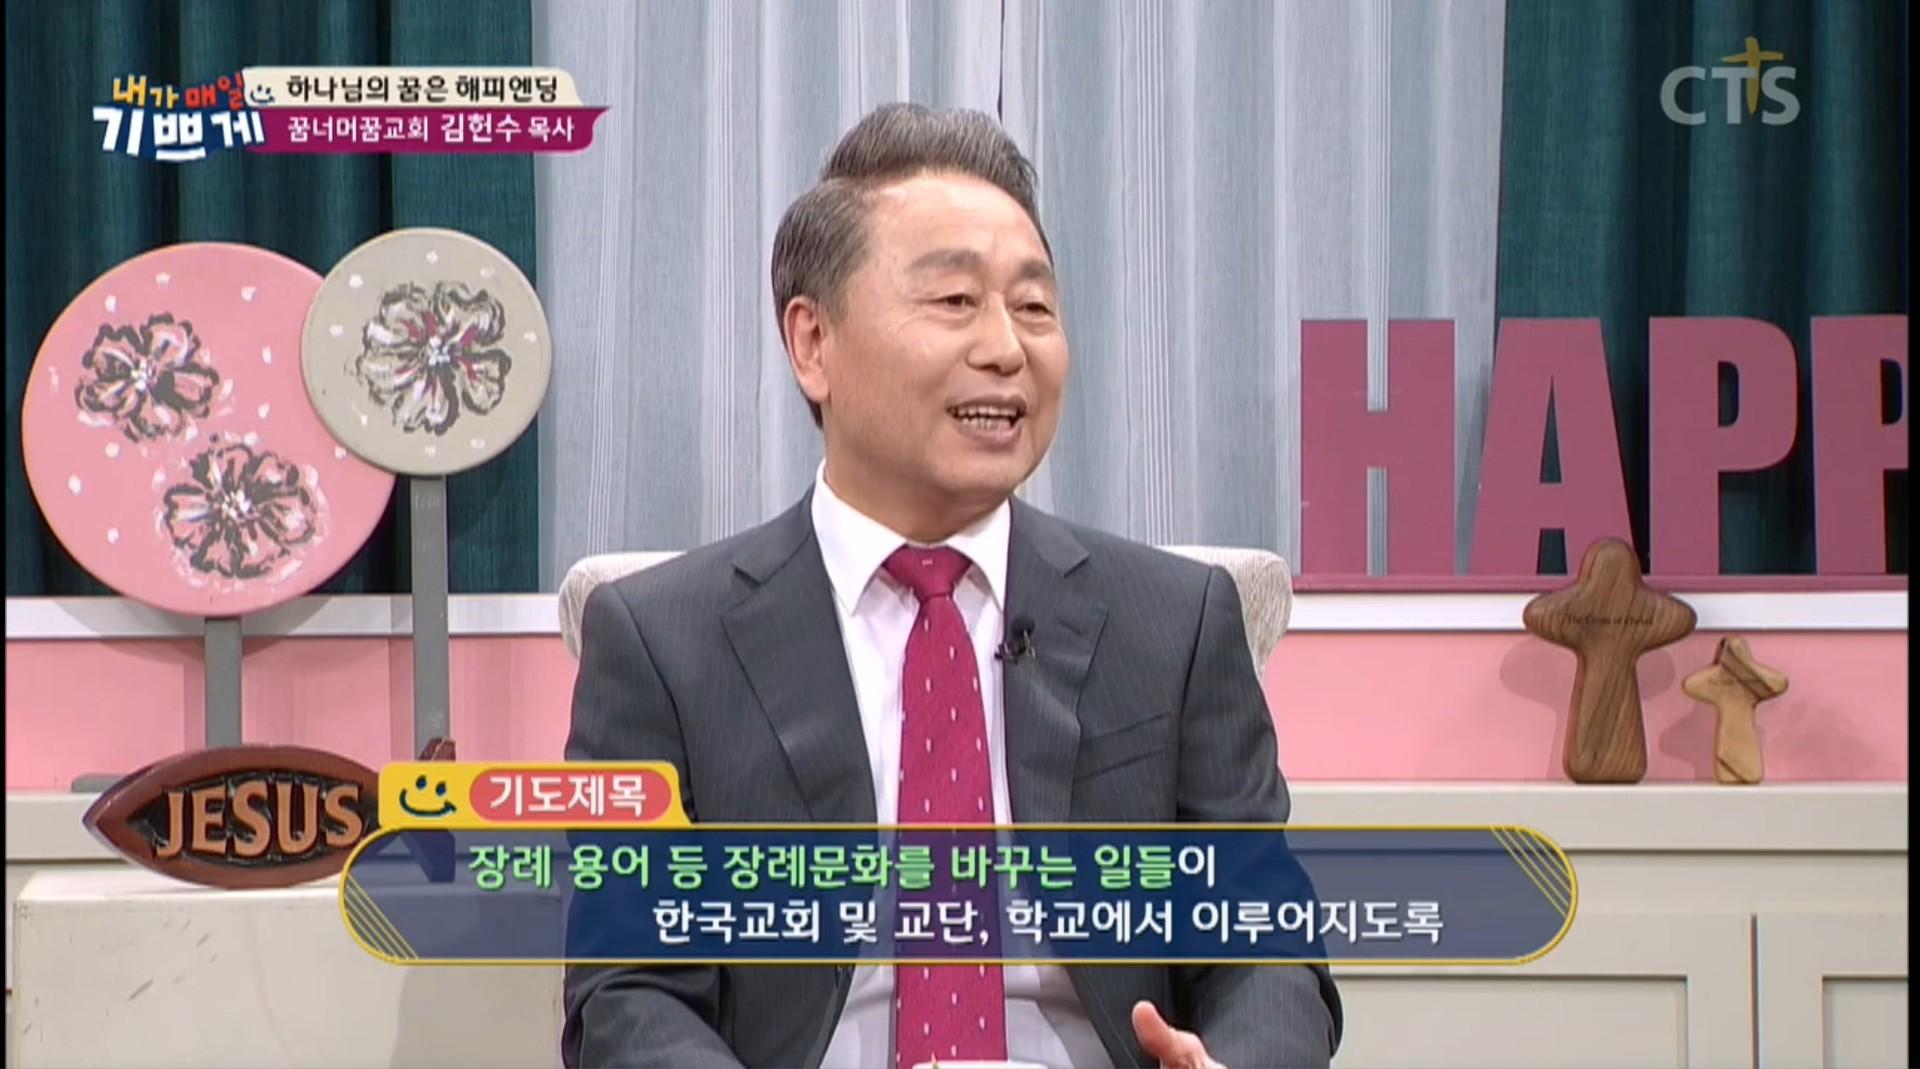 CTS TV '내가 매일 기쁘게' 출연 :  투헤븐선교회 대표 김헌수(꿈너머꿈교회 담임목사)